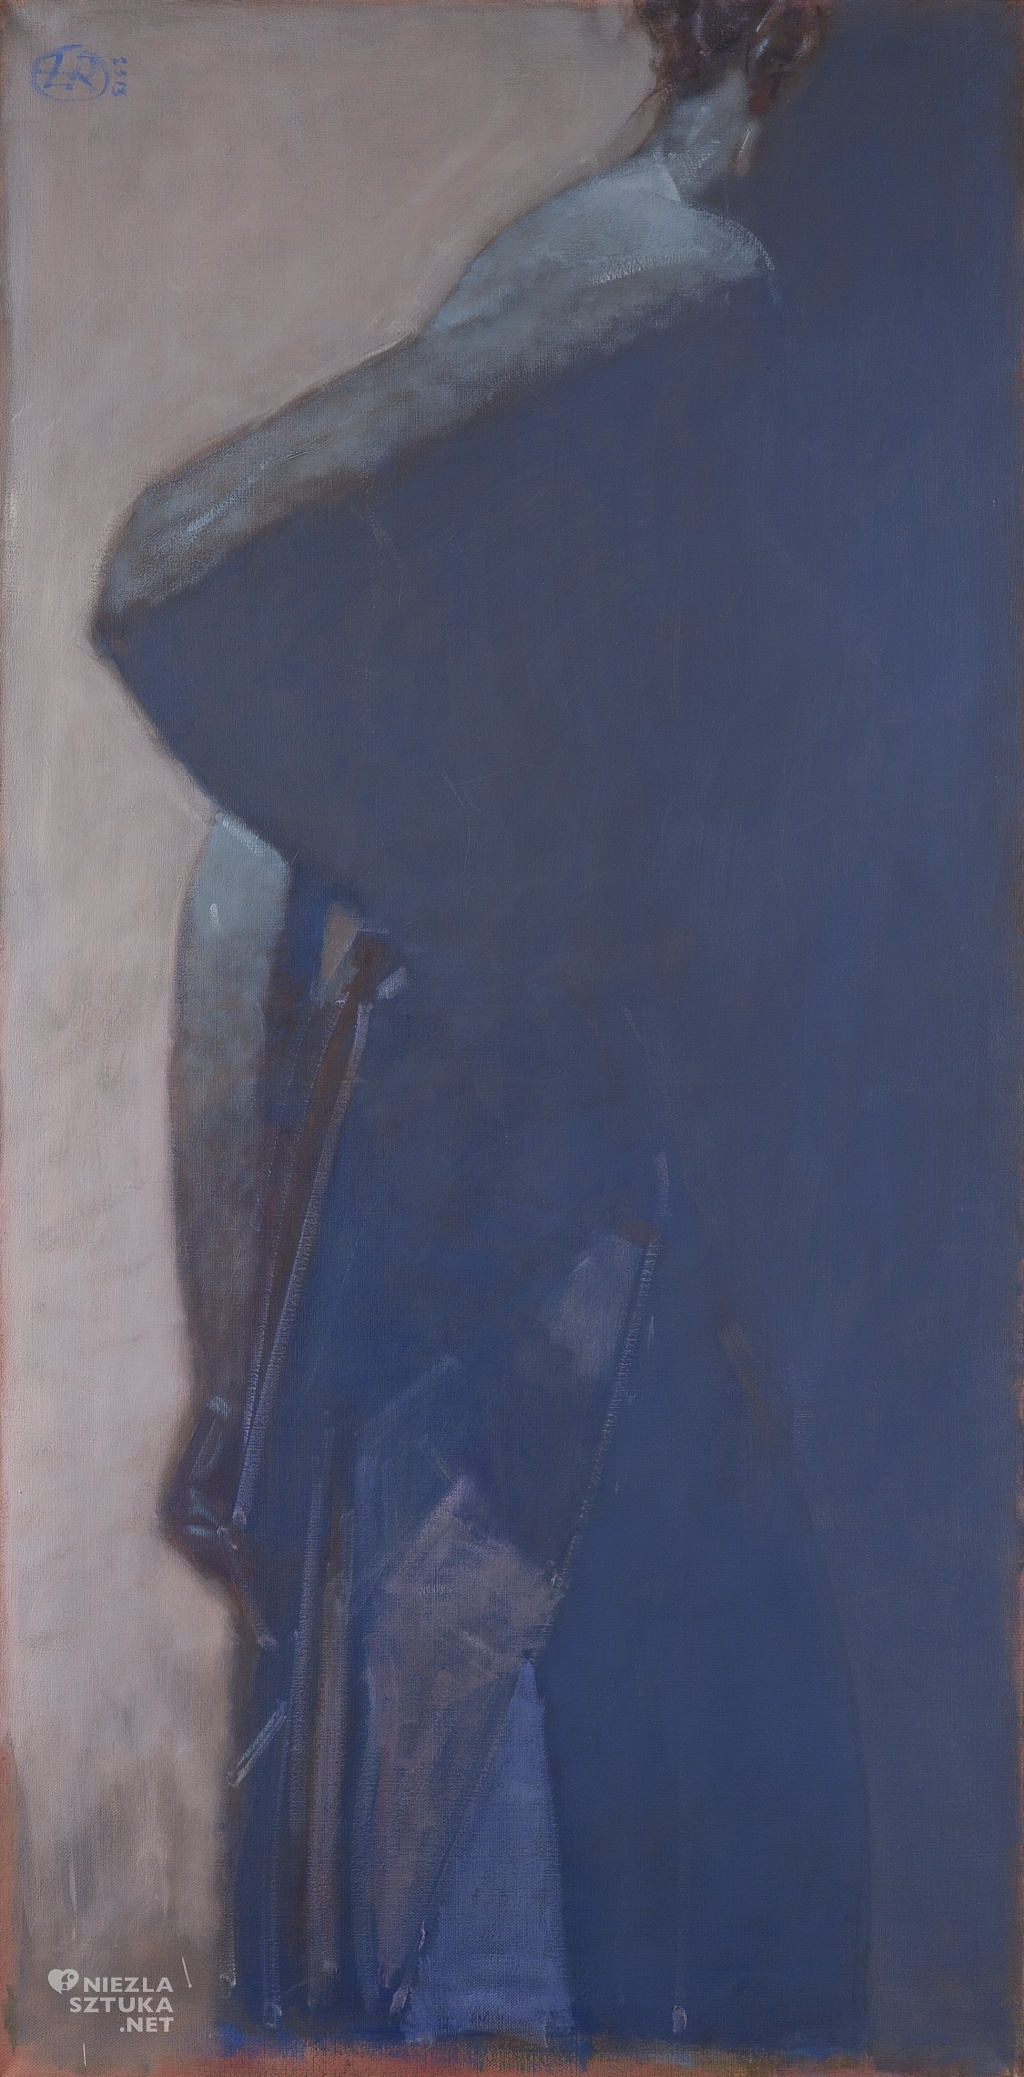 Wielka niekąpiąca błękitna | 2013